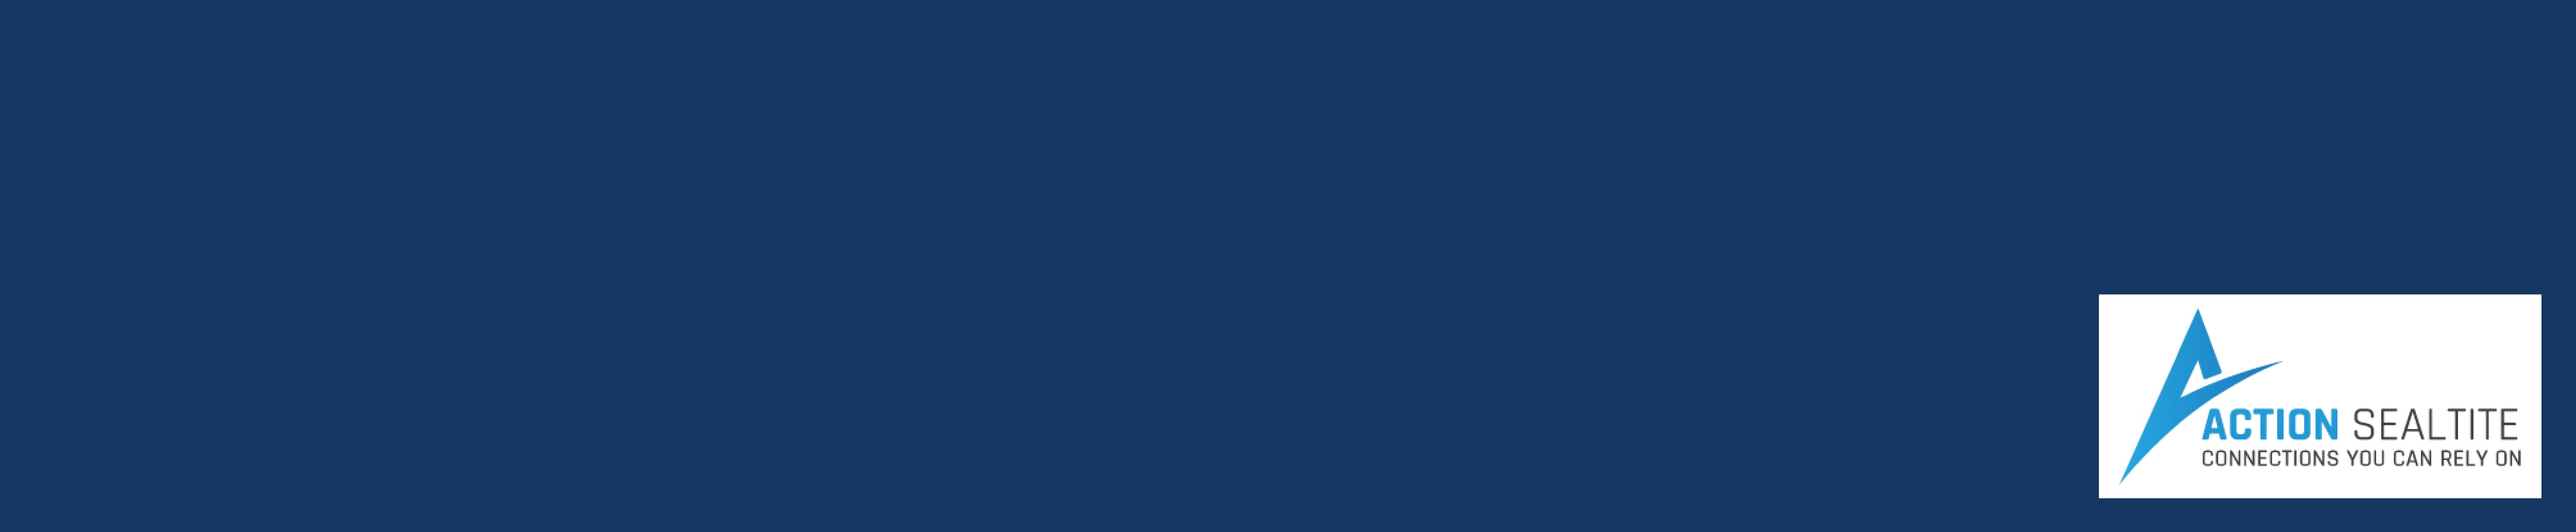 Action sealtite page header banner@2x-8